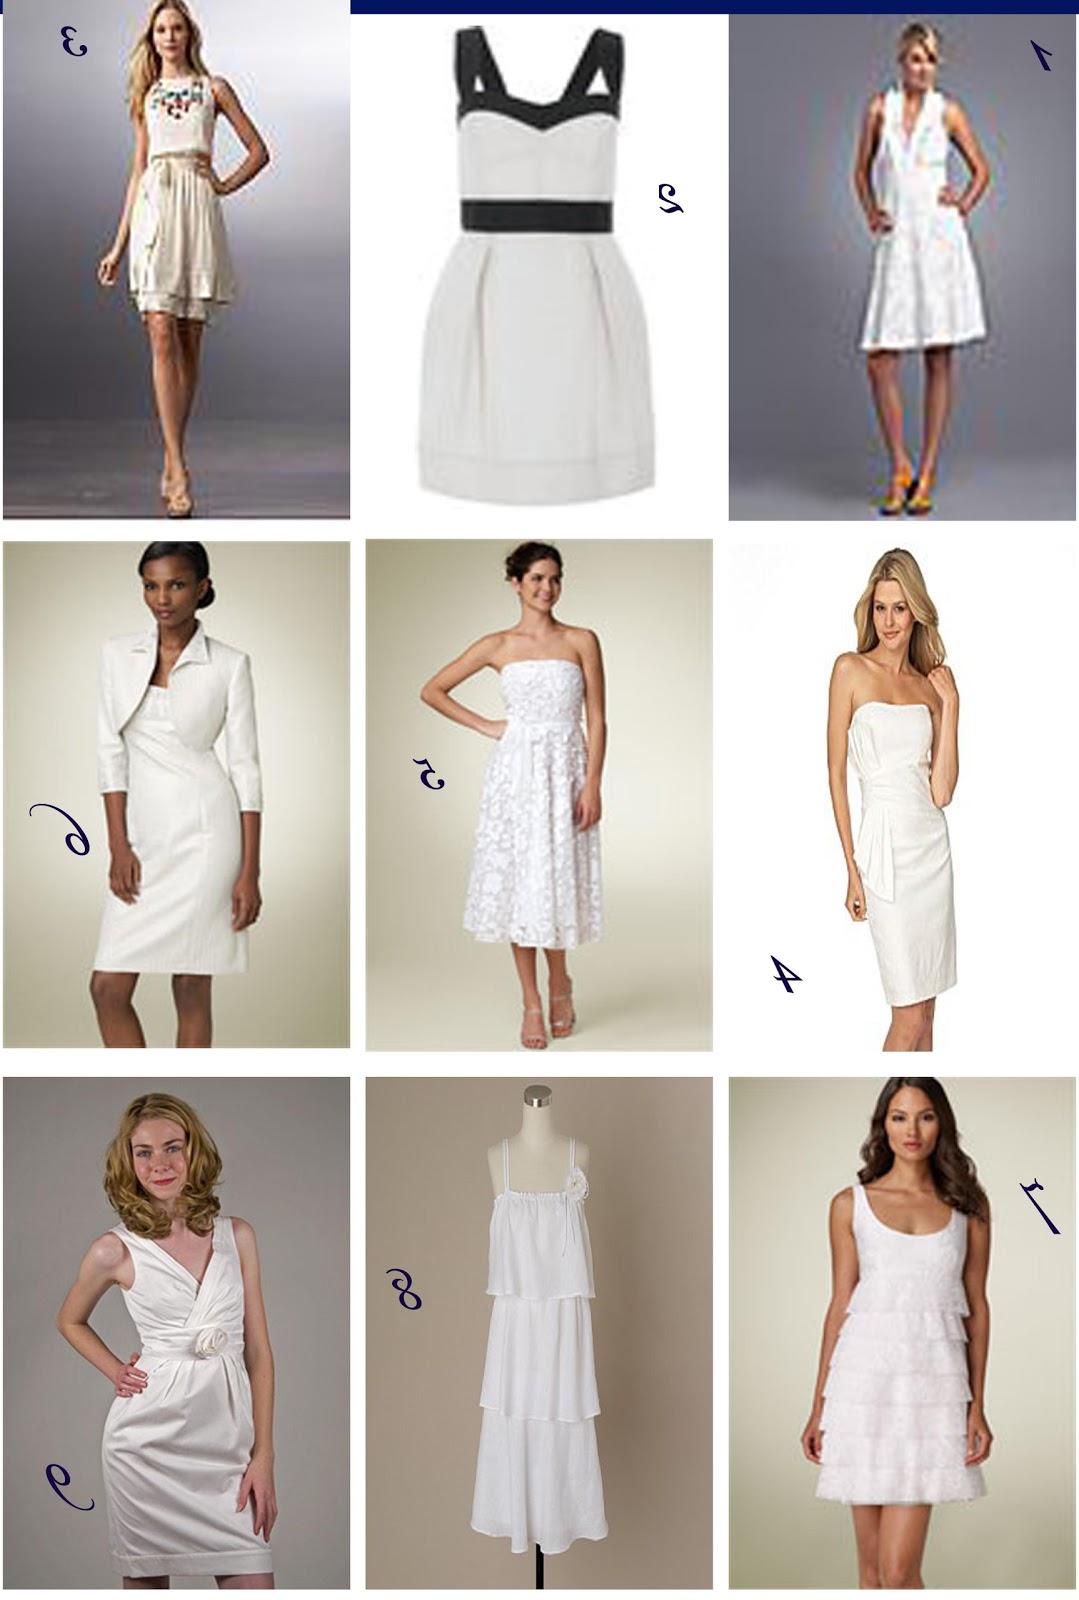 court wedding dresses images courthouse wedding dresses Court House Wedding Dresses Jalissa S Blog Wedding Cowboy Boots